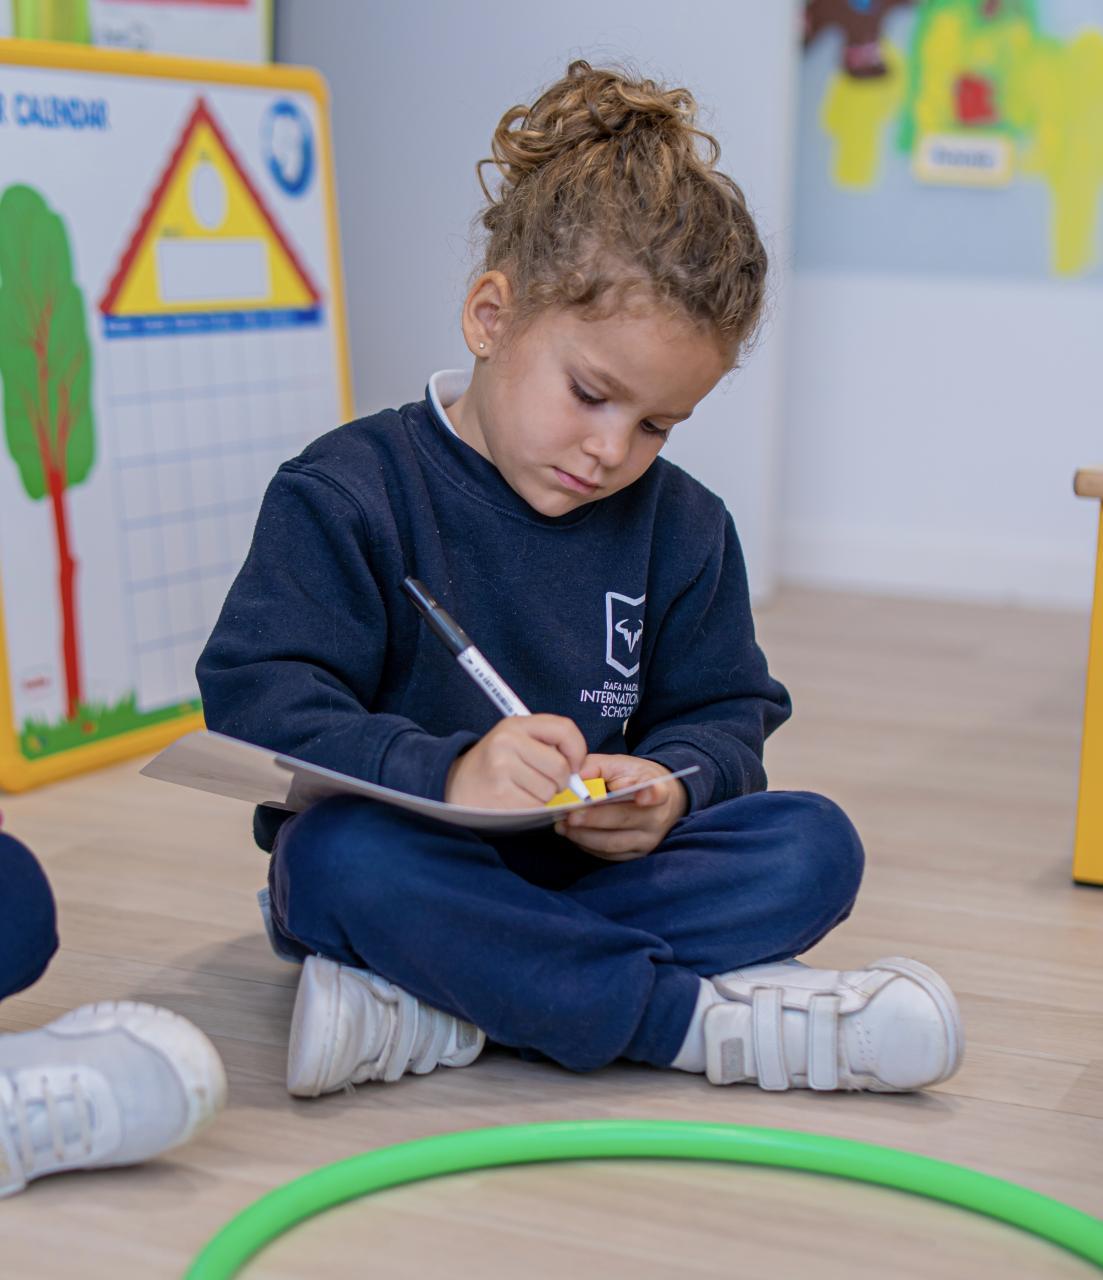 Rafa Nadal International School interactive learning